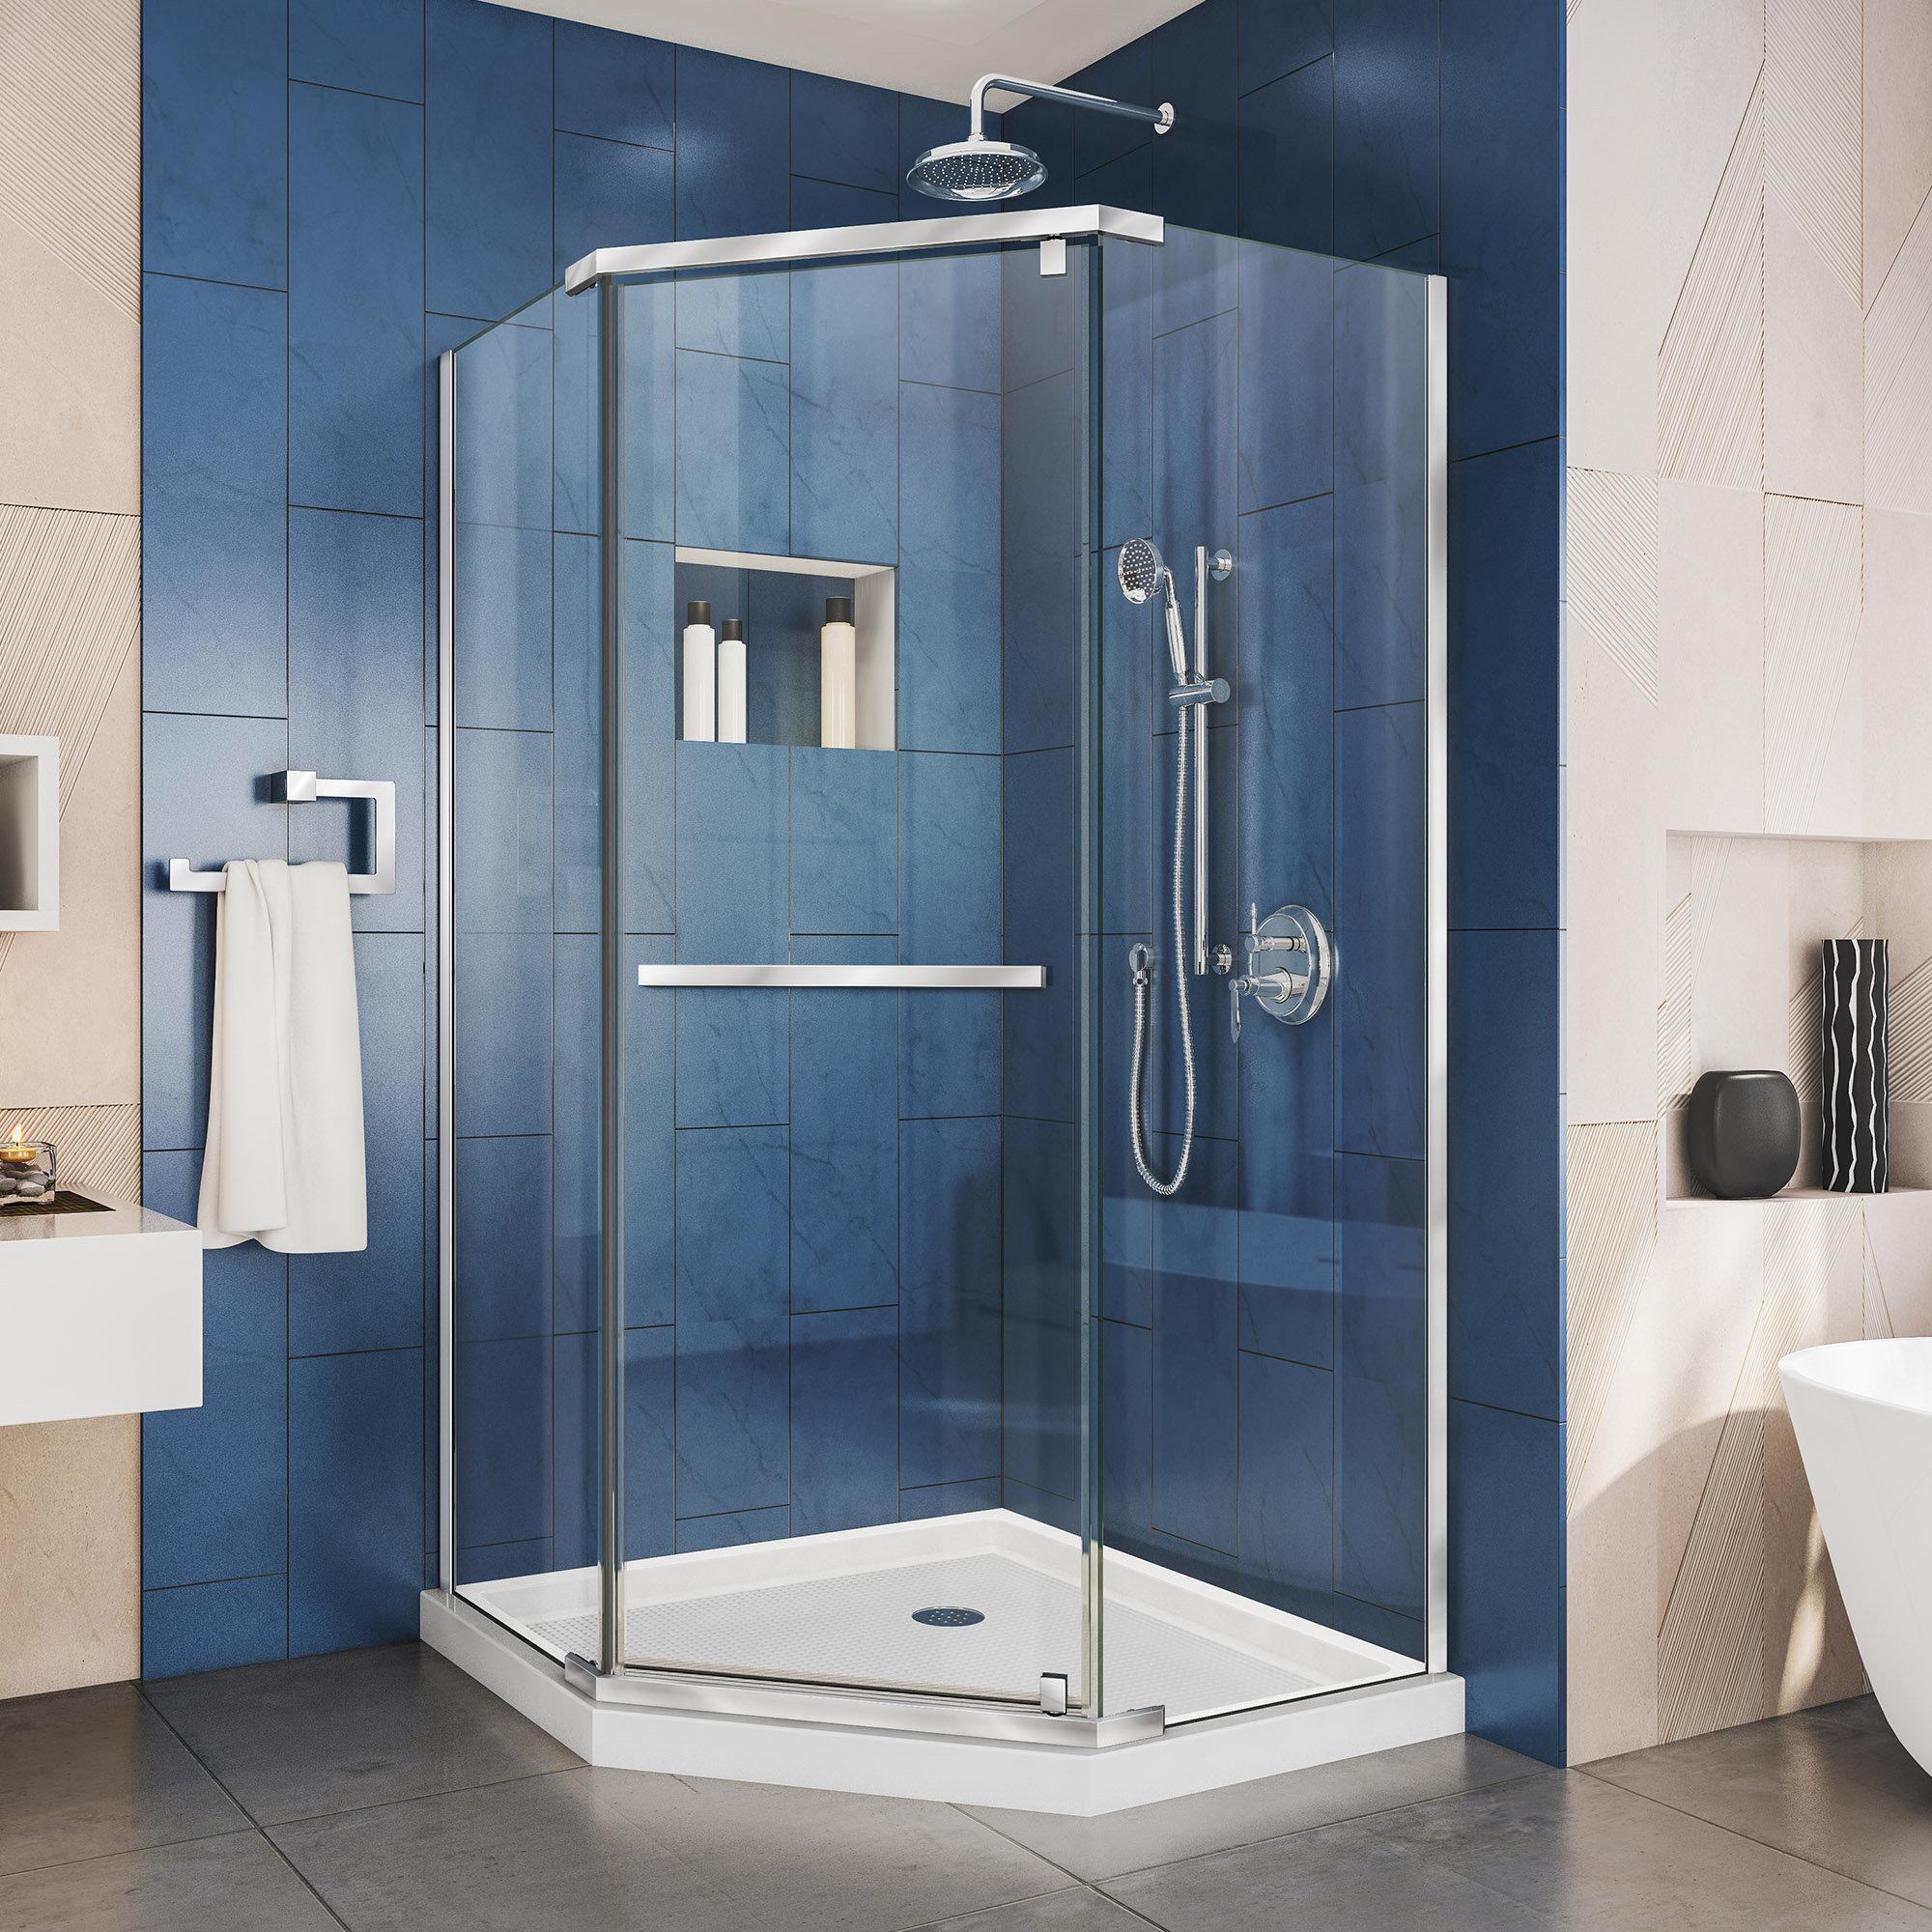 Dreamline Prism 42 X 74 75 Neo Angle Pivot Shower Enclosure